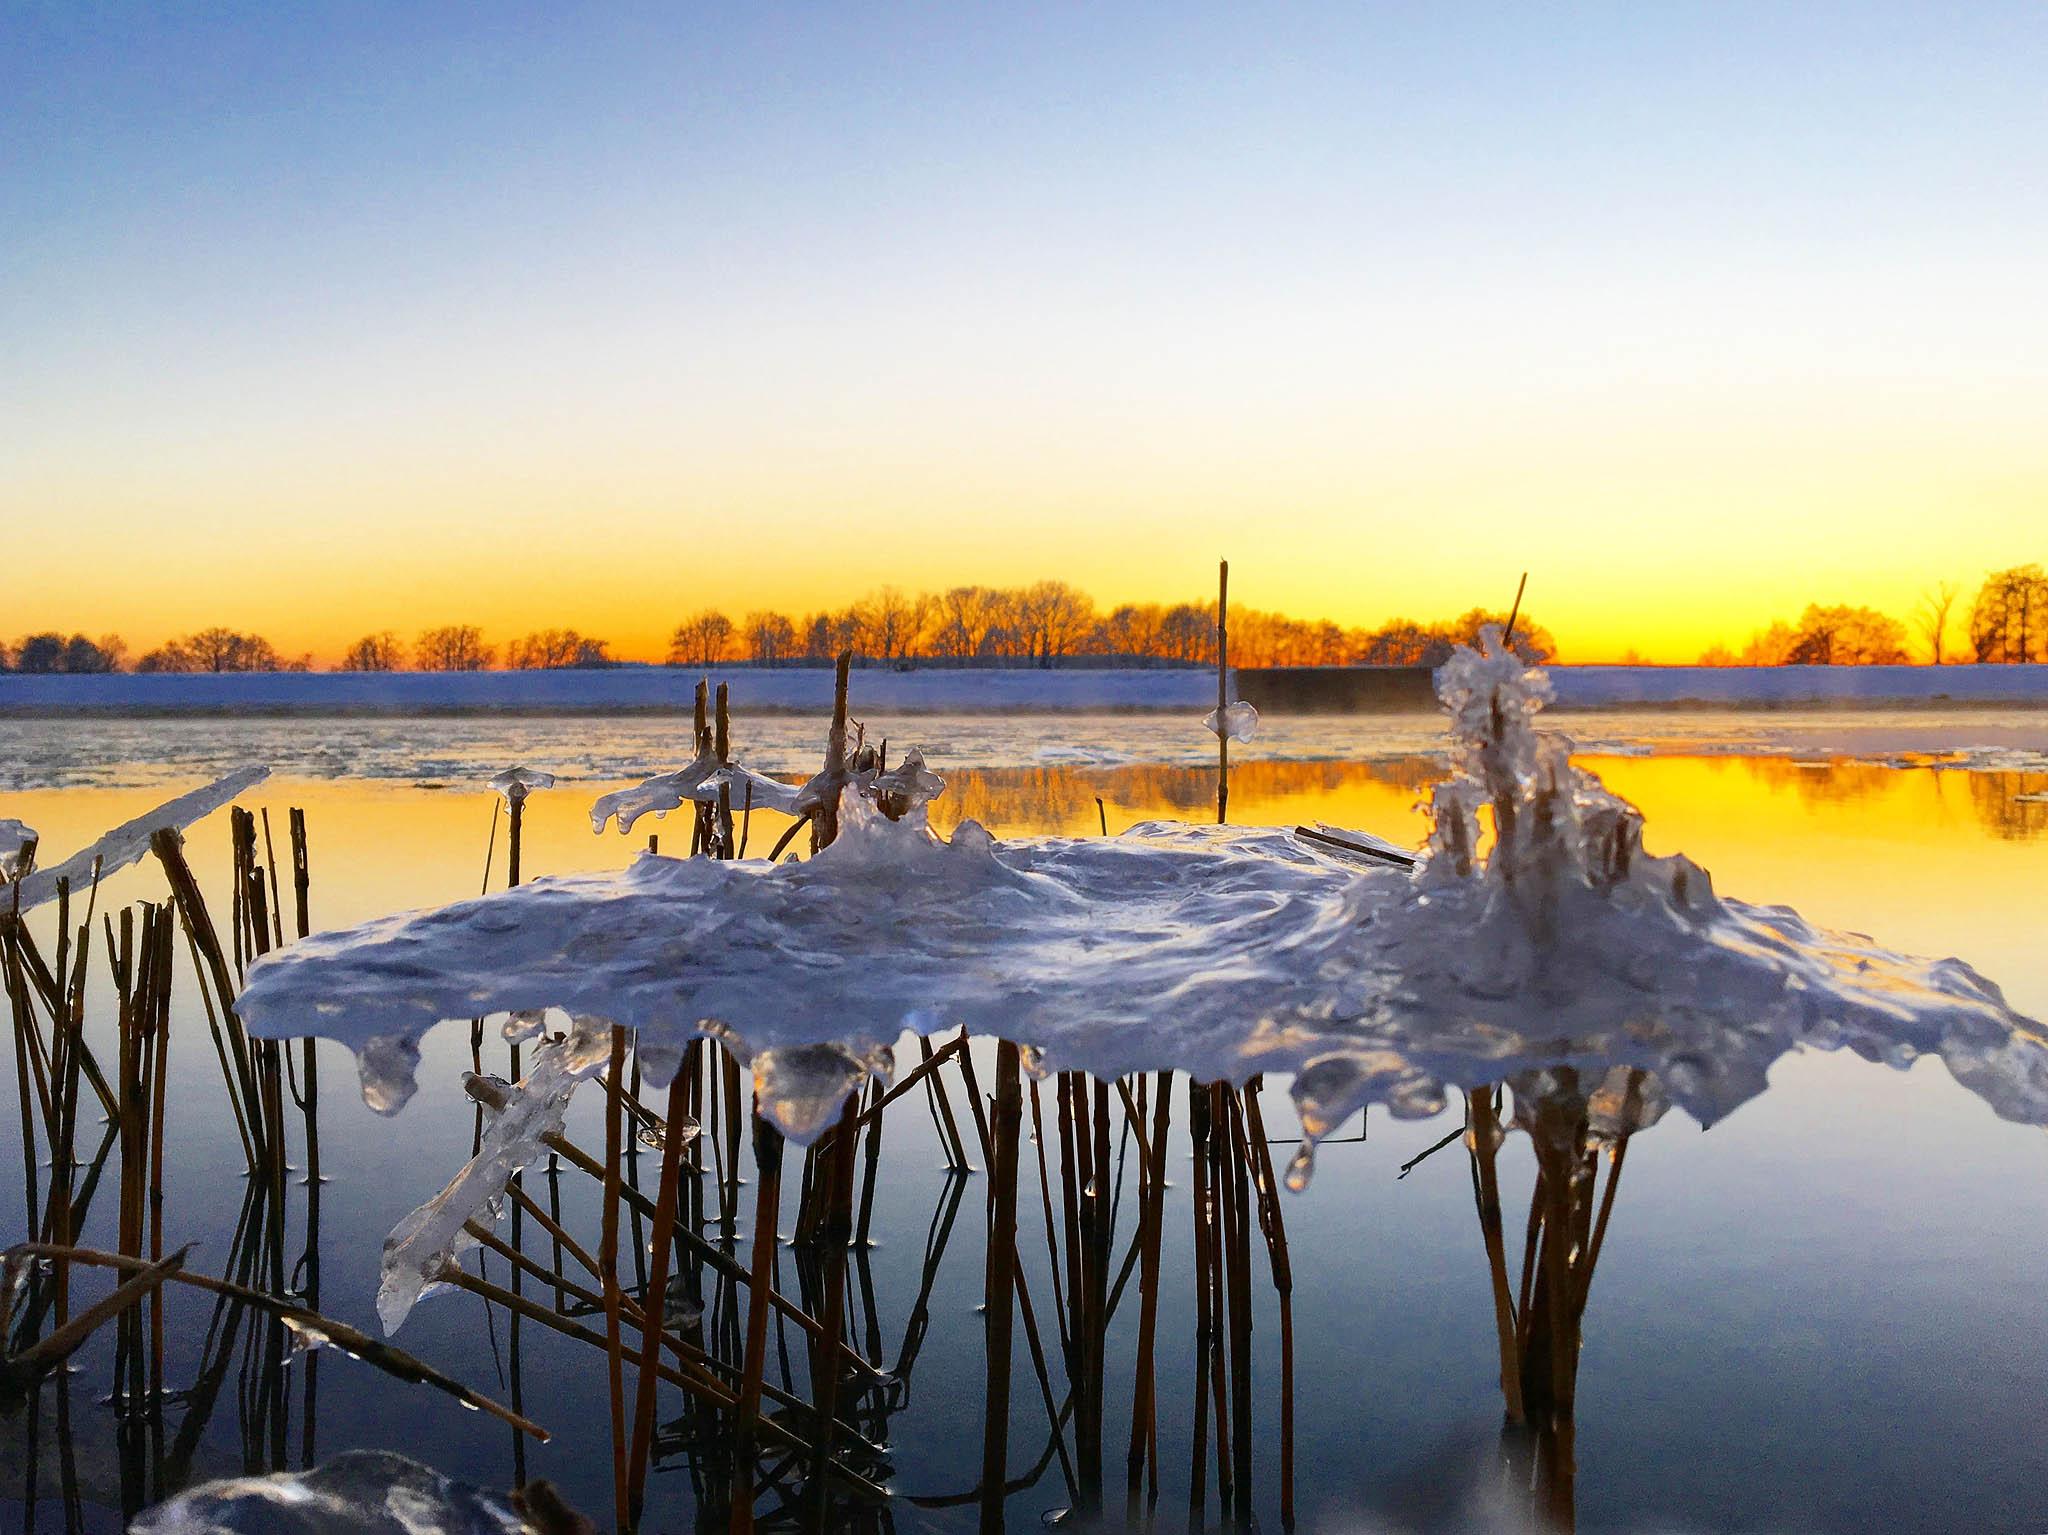 Wintercamping am Main-Donau-Kanal nahe Nürnberg.